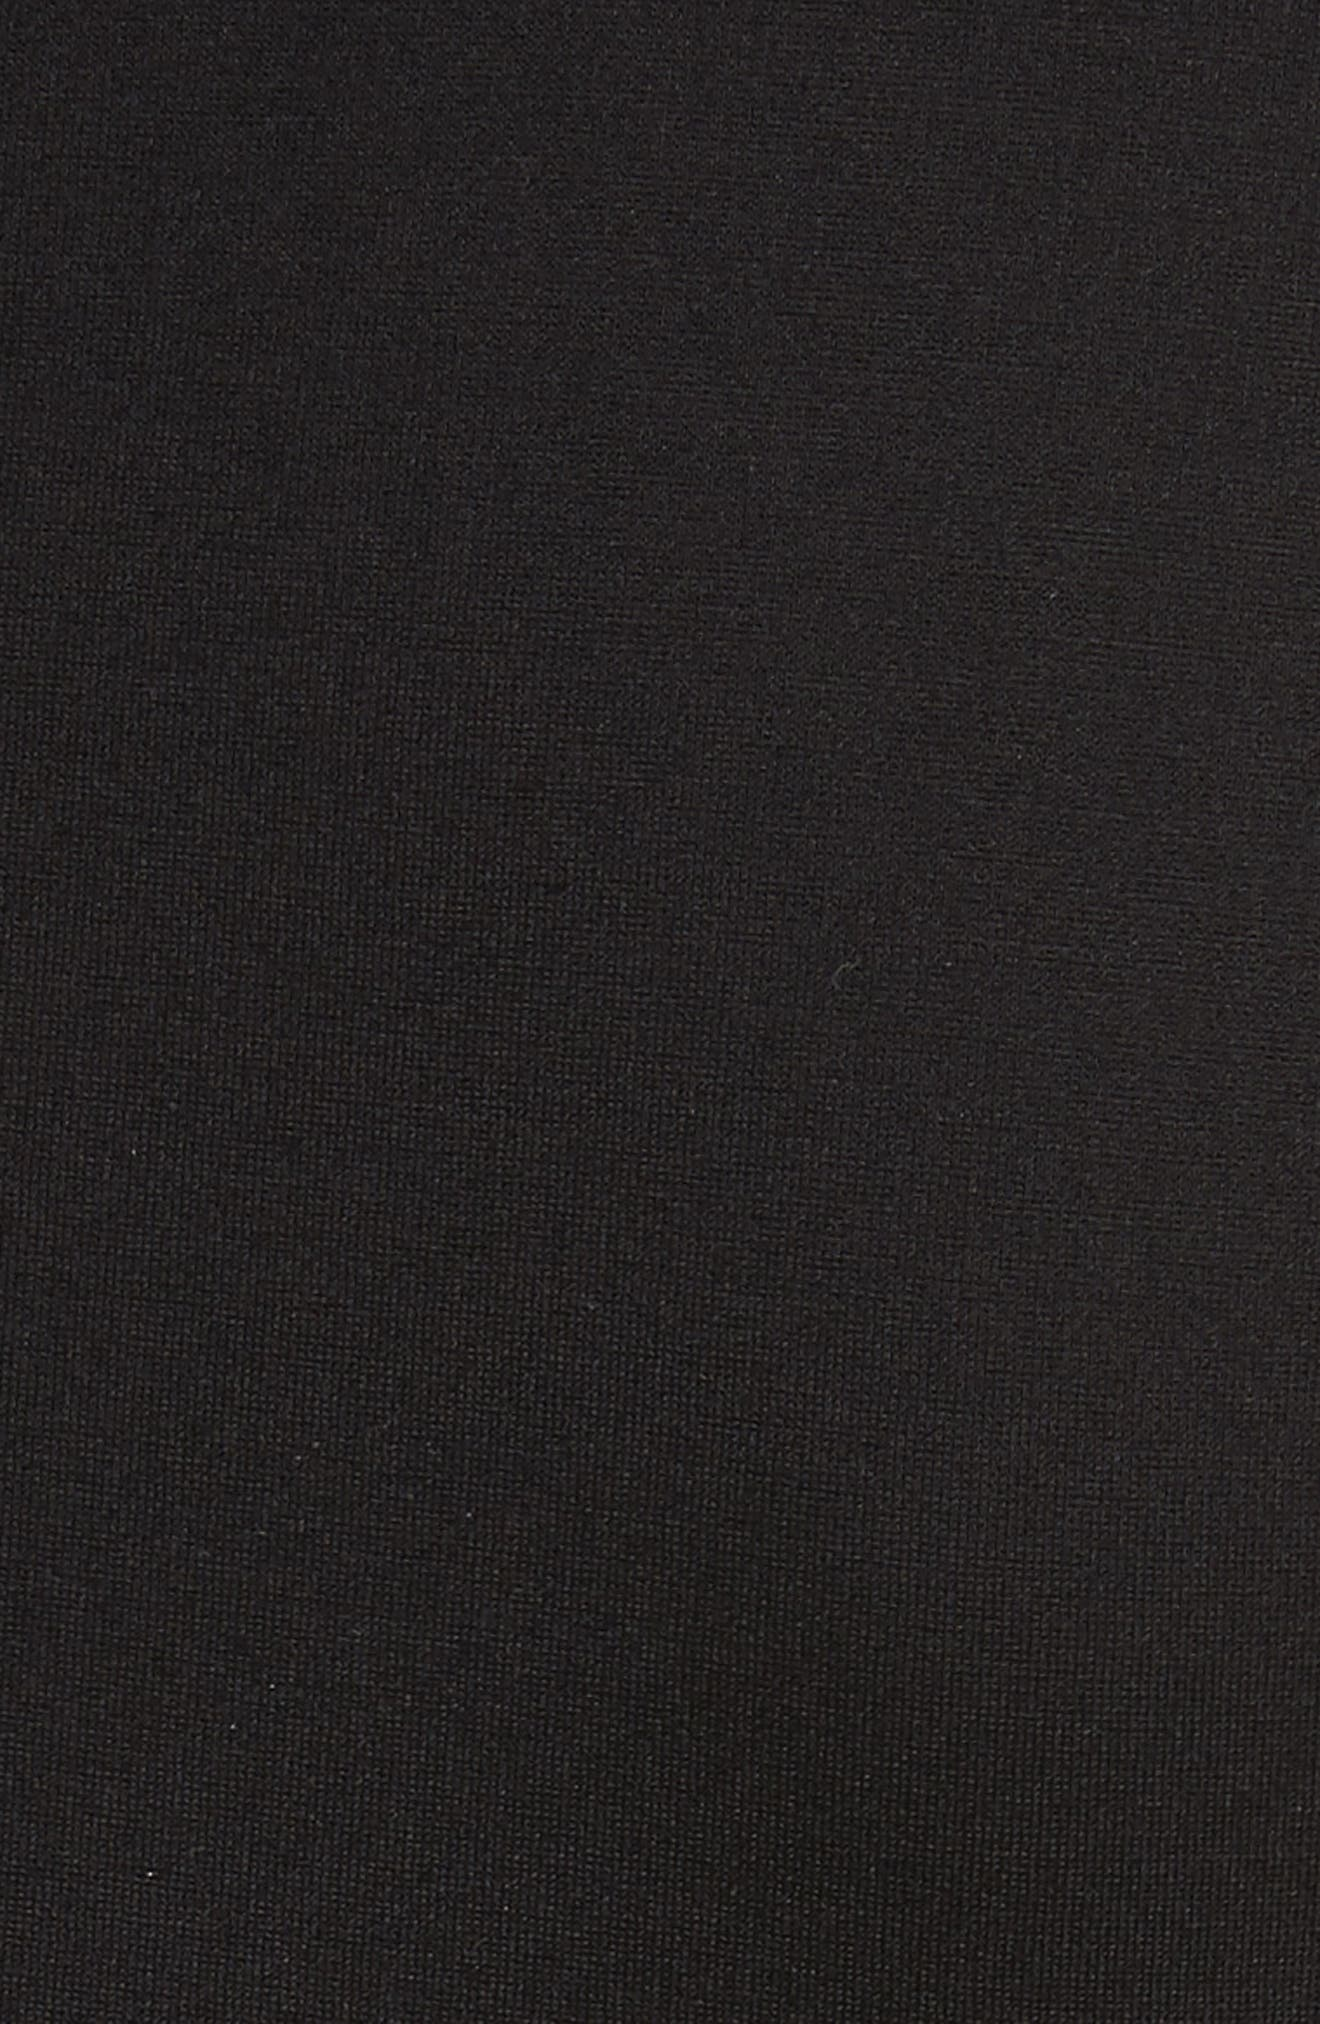 Codi Embroidered Scallop A-Line Dress,                             Alternate thumbnail 5, color,                             001